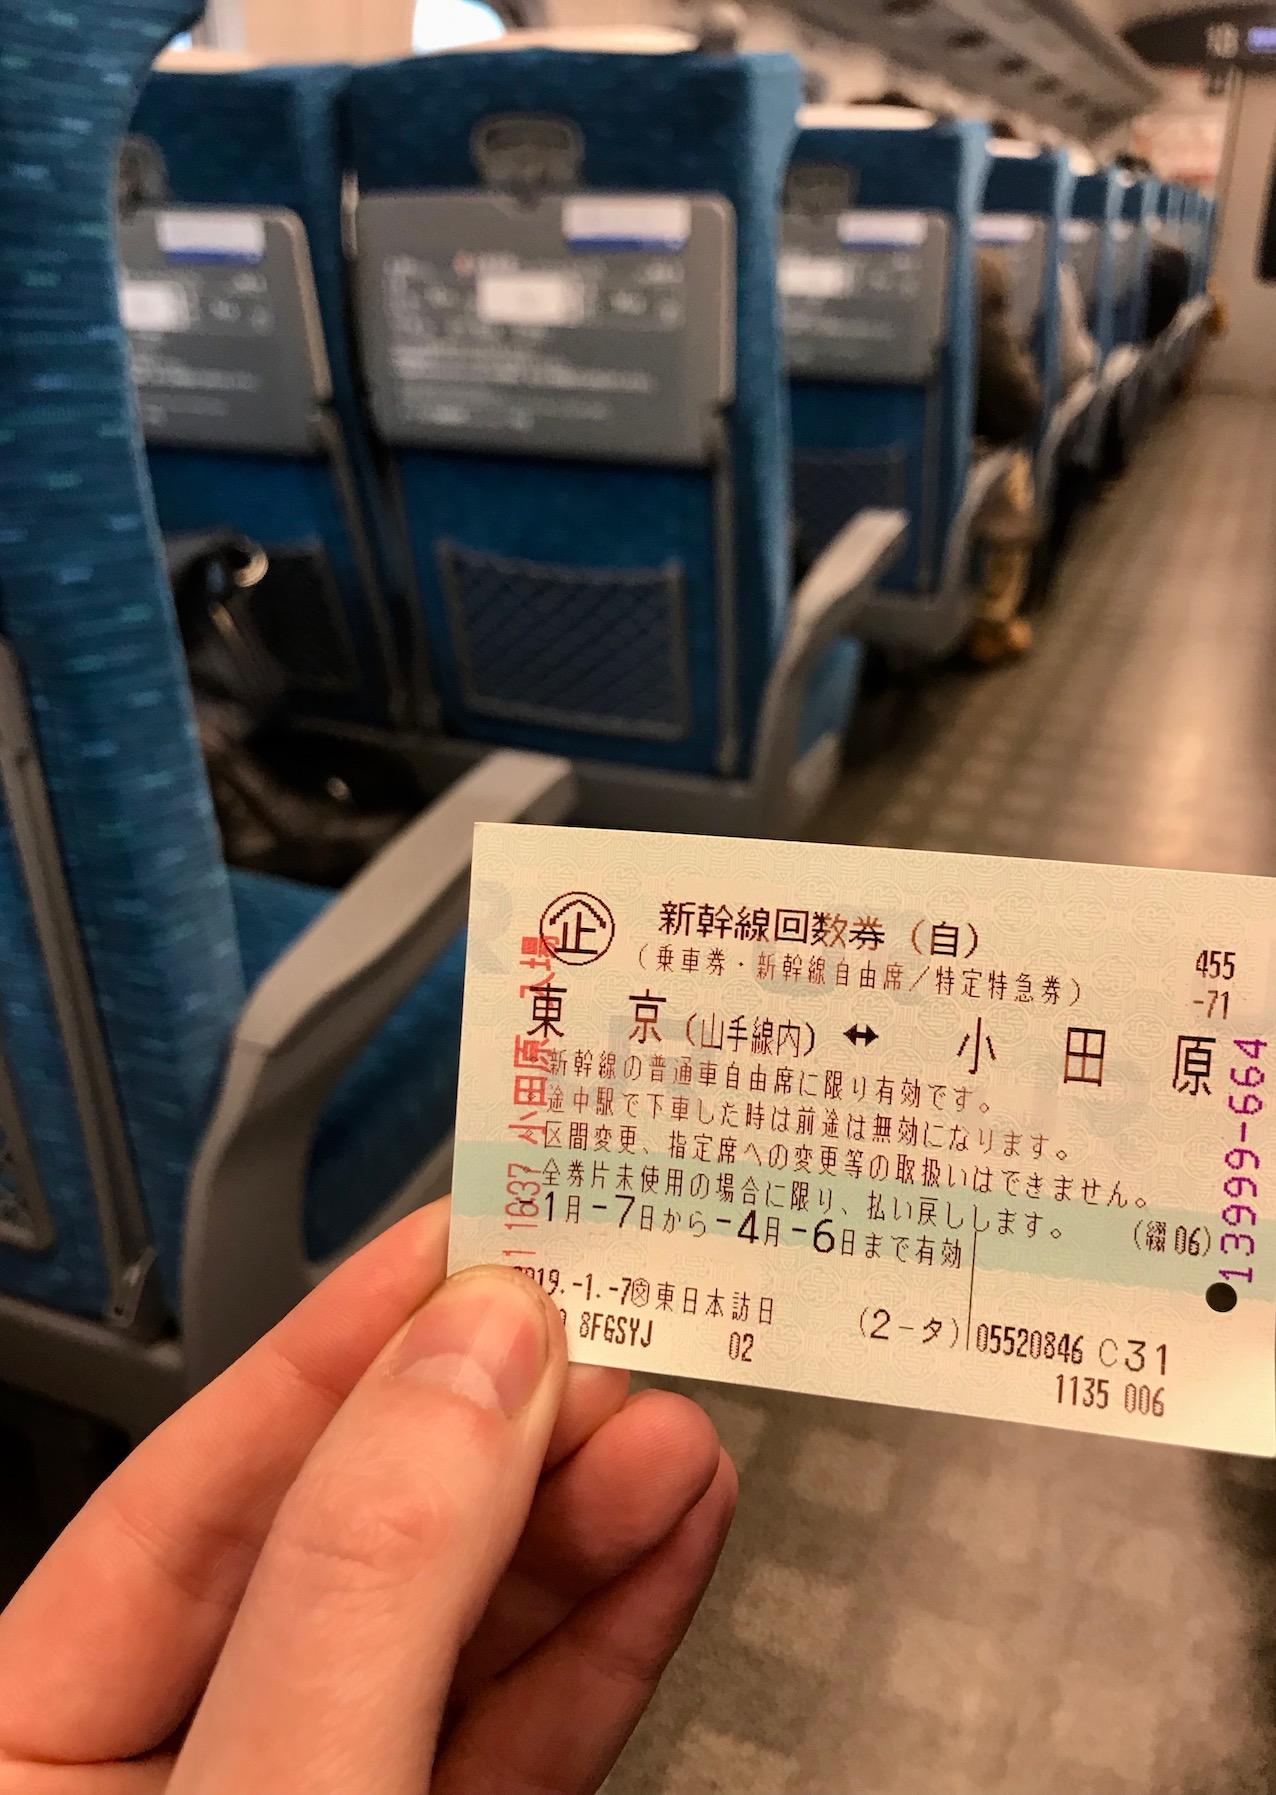 Shinkansen Bullet Train ticket Japan.